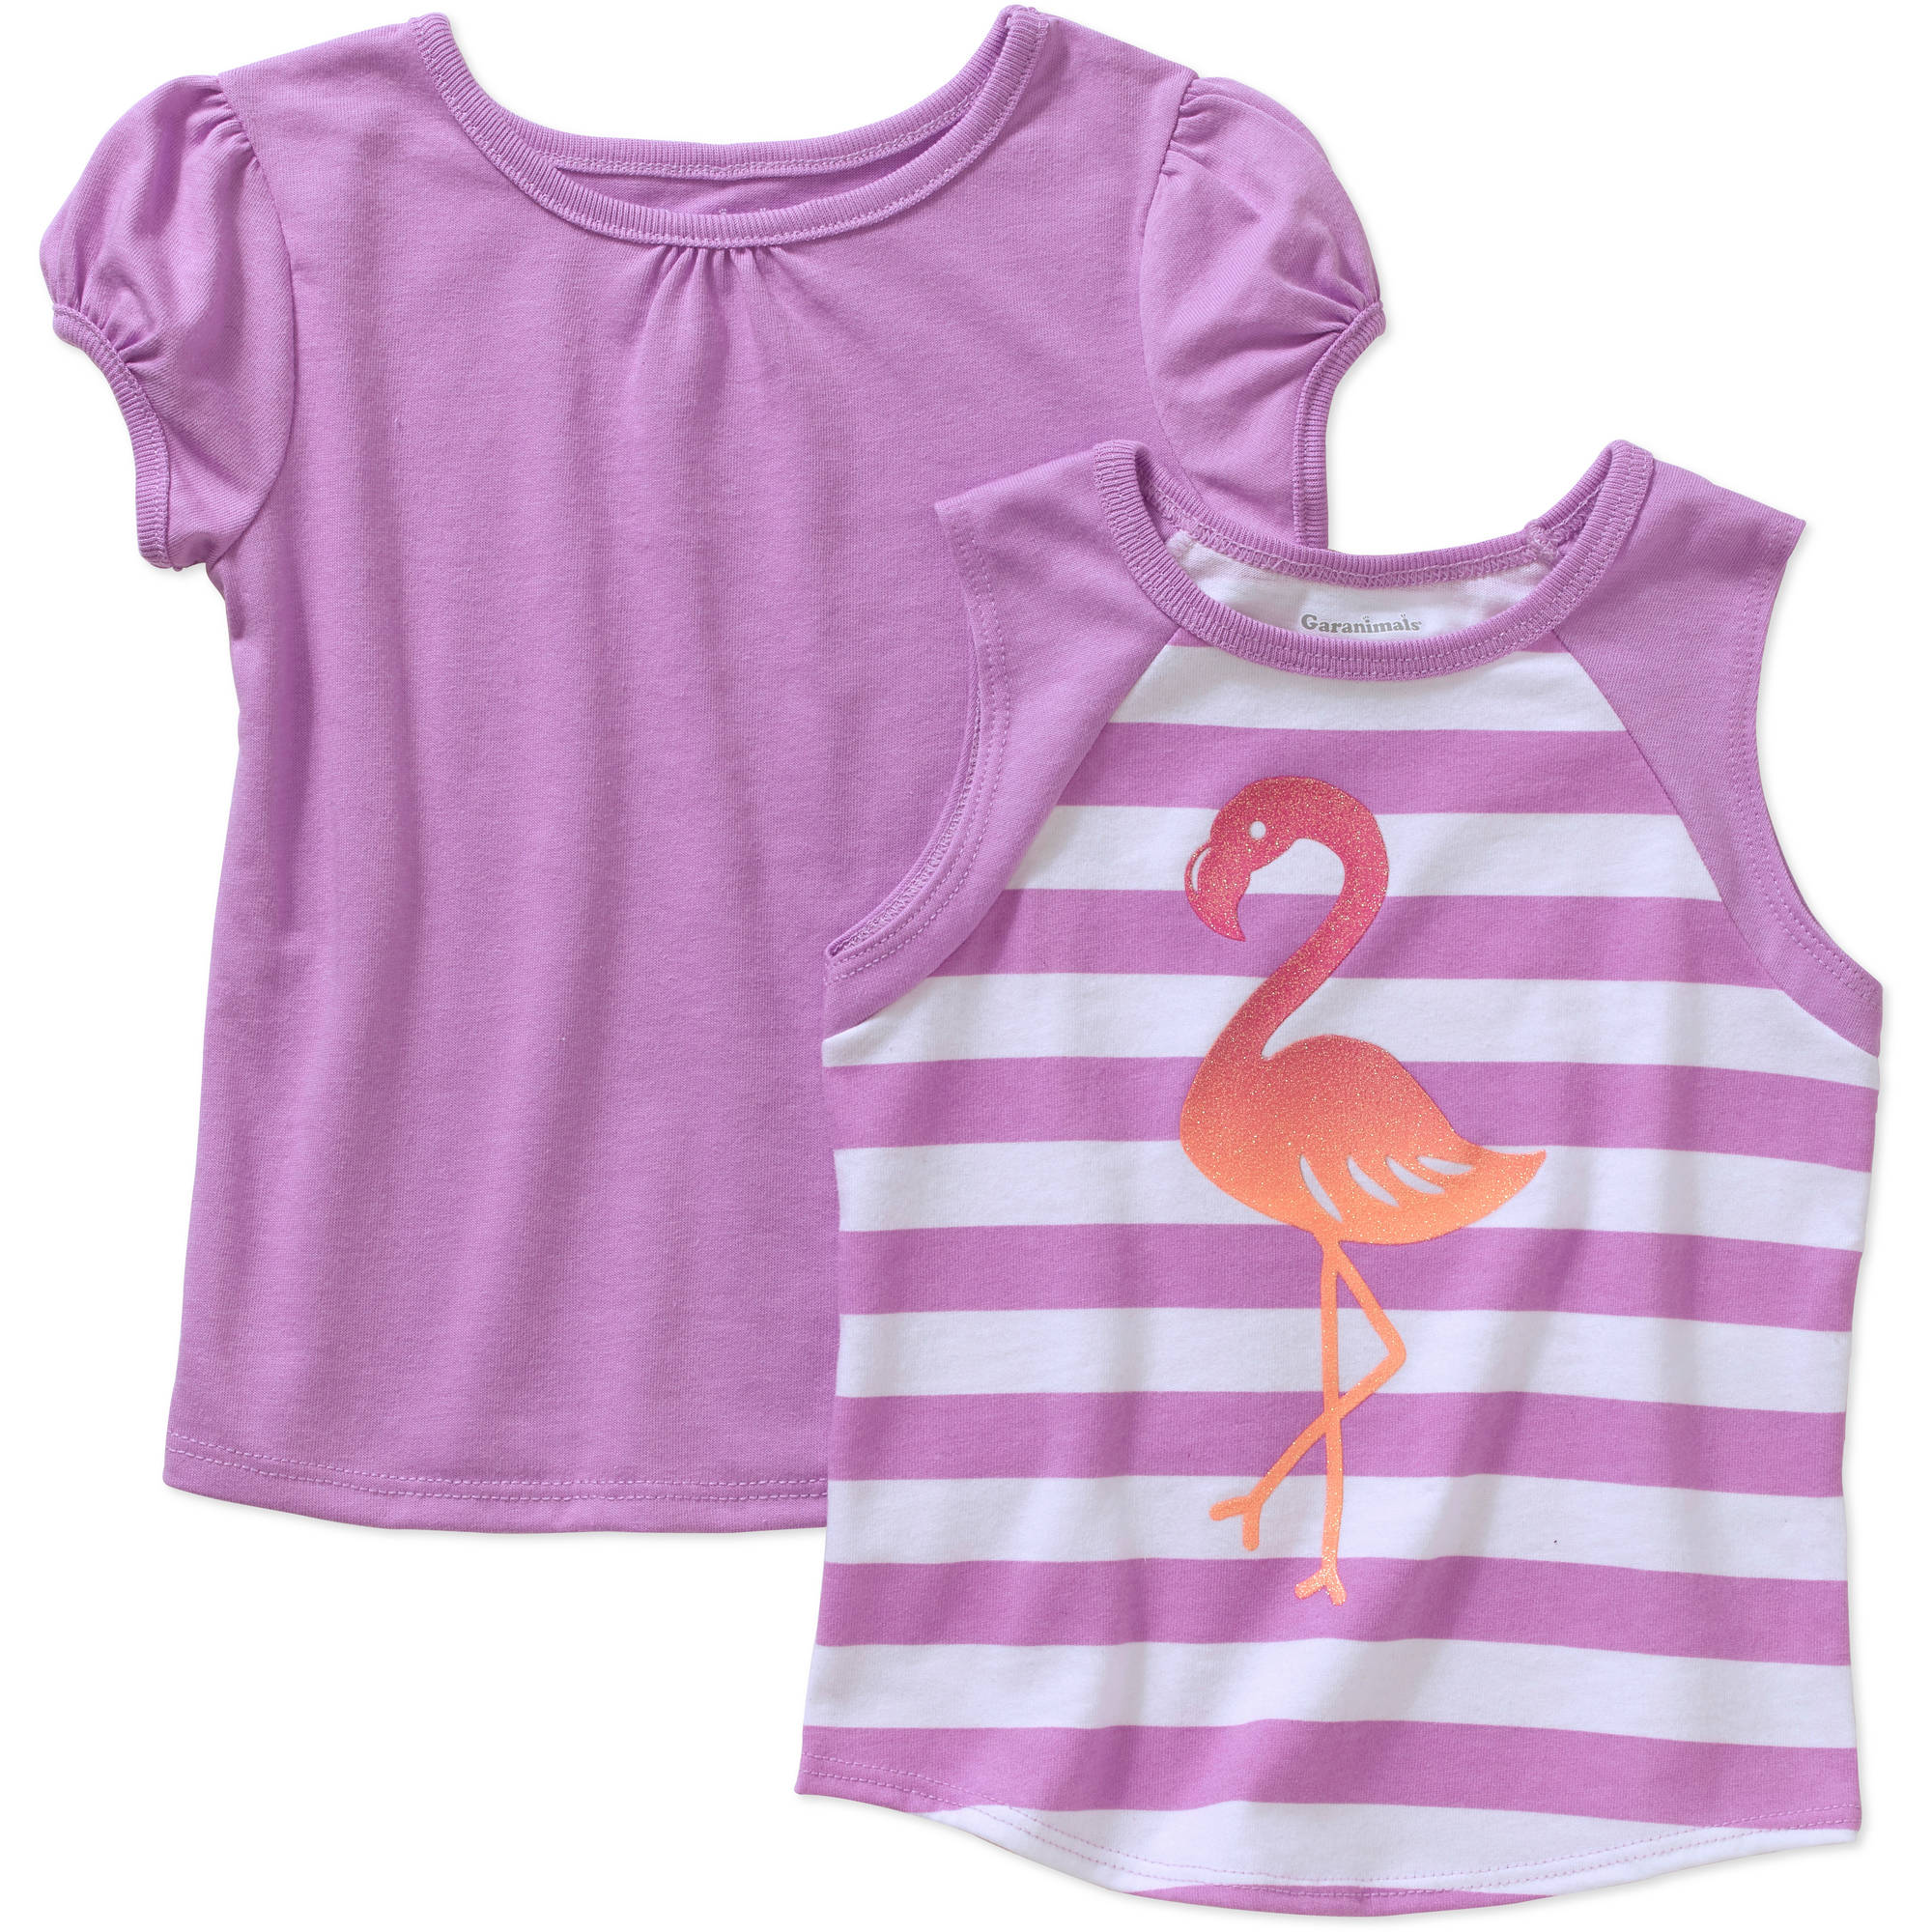 Newborn Baby Girl Printed Knit Jegging Shorts - Walmart.com